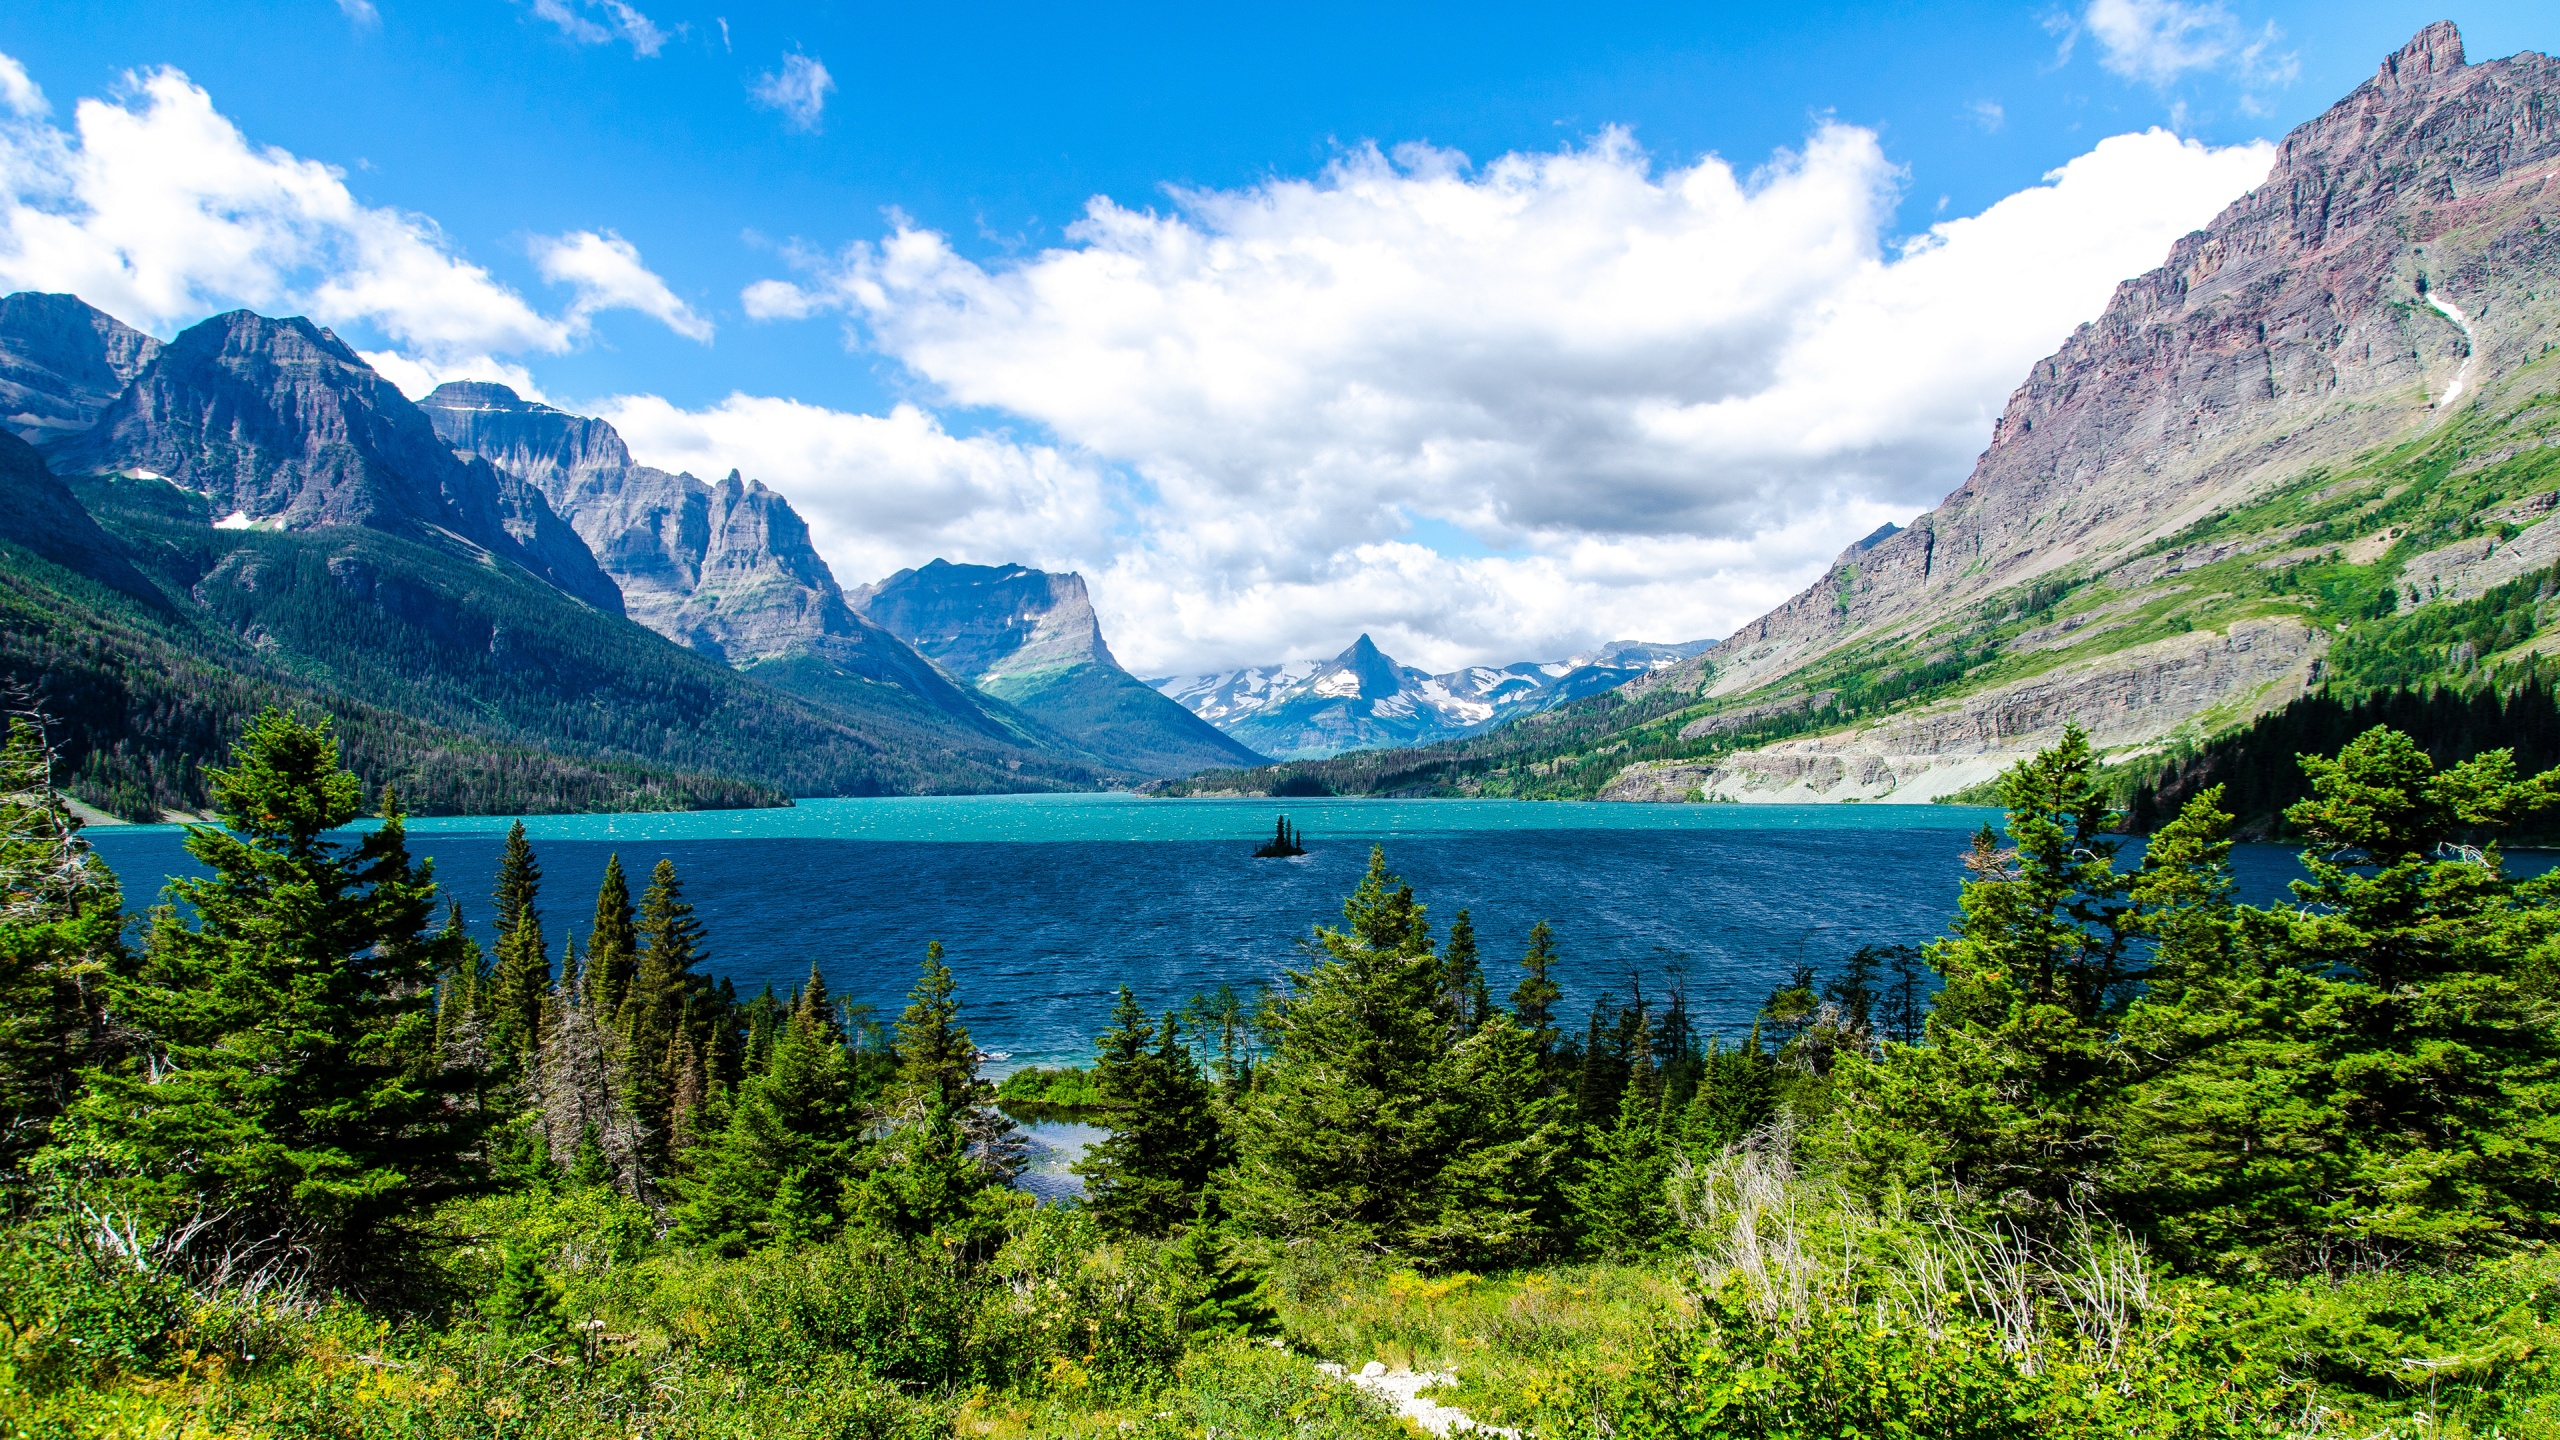 Saint Mary Lake Glacier National Park Wallpapers HD Wallpapers 2560x1440